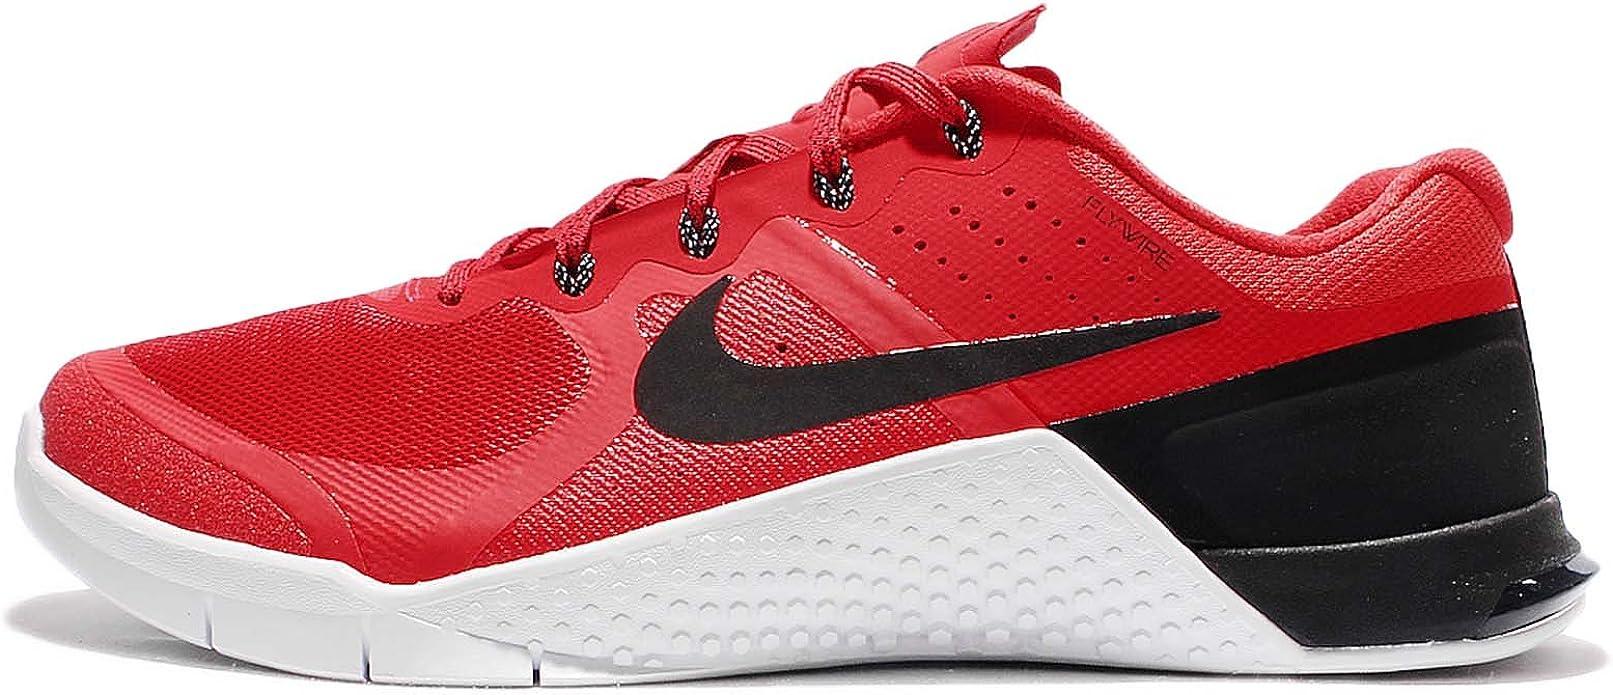 Nike Men's Metcon 2, Action RED